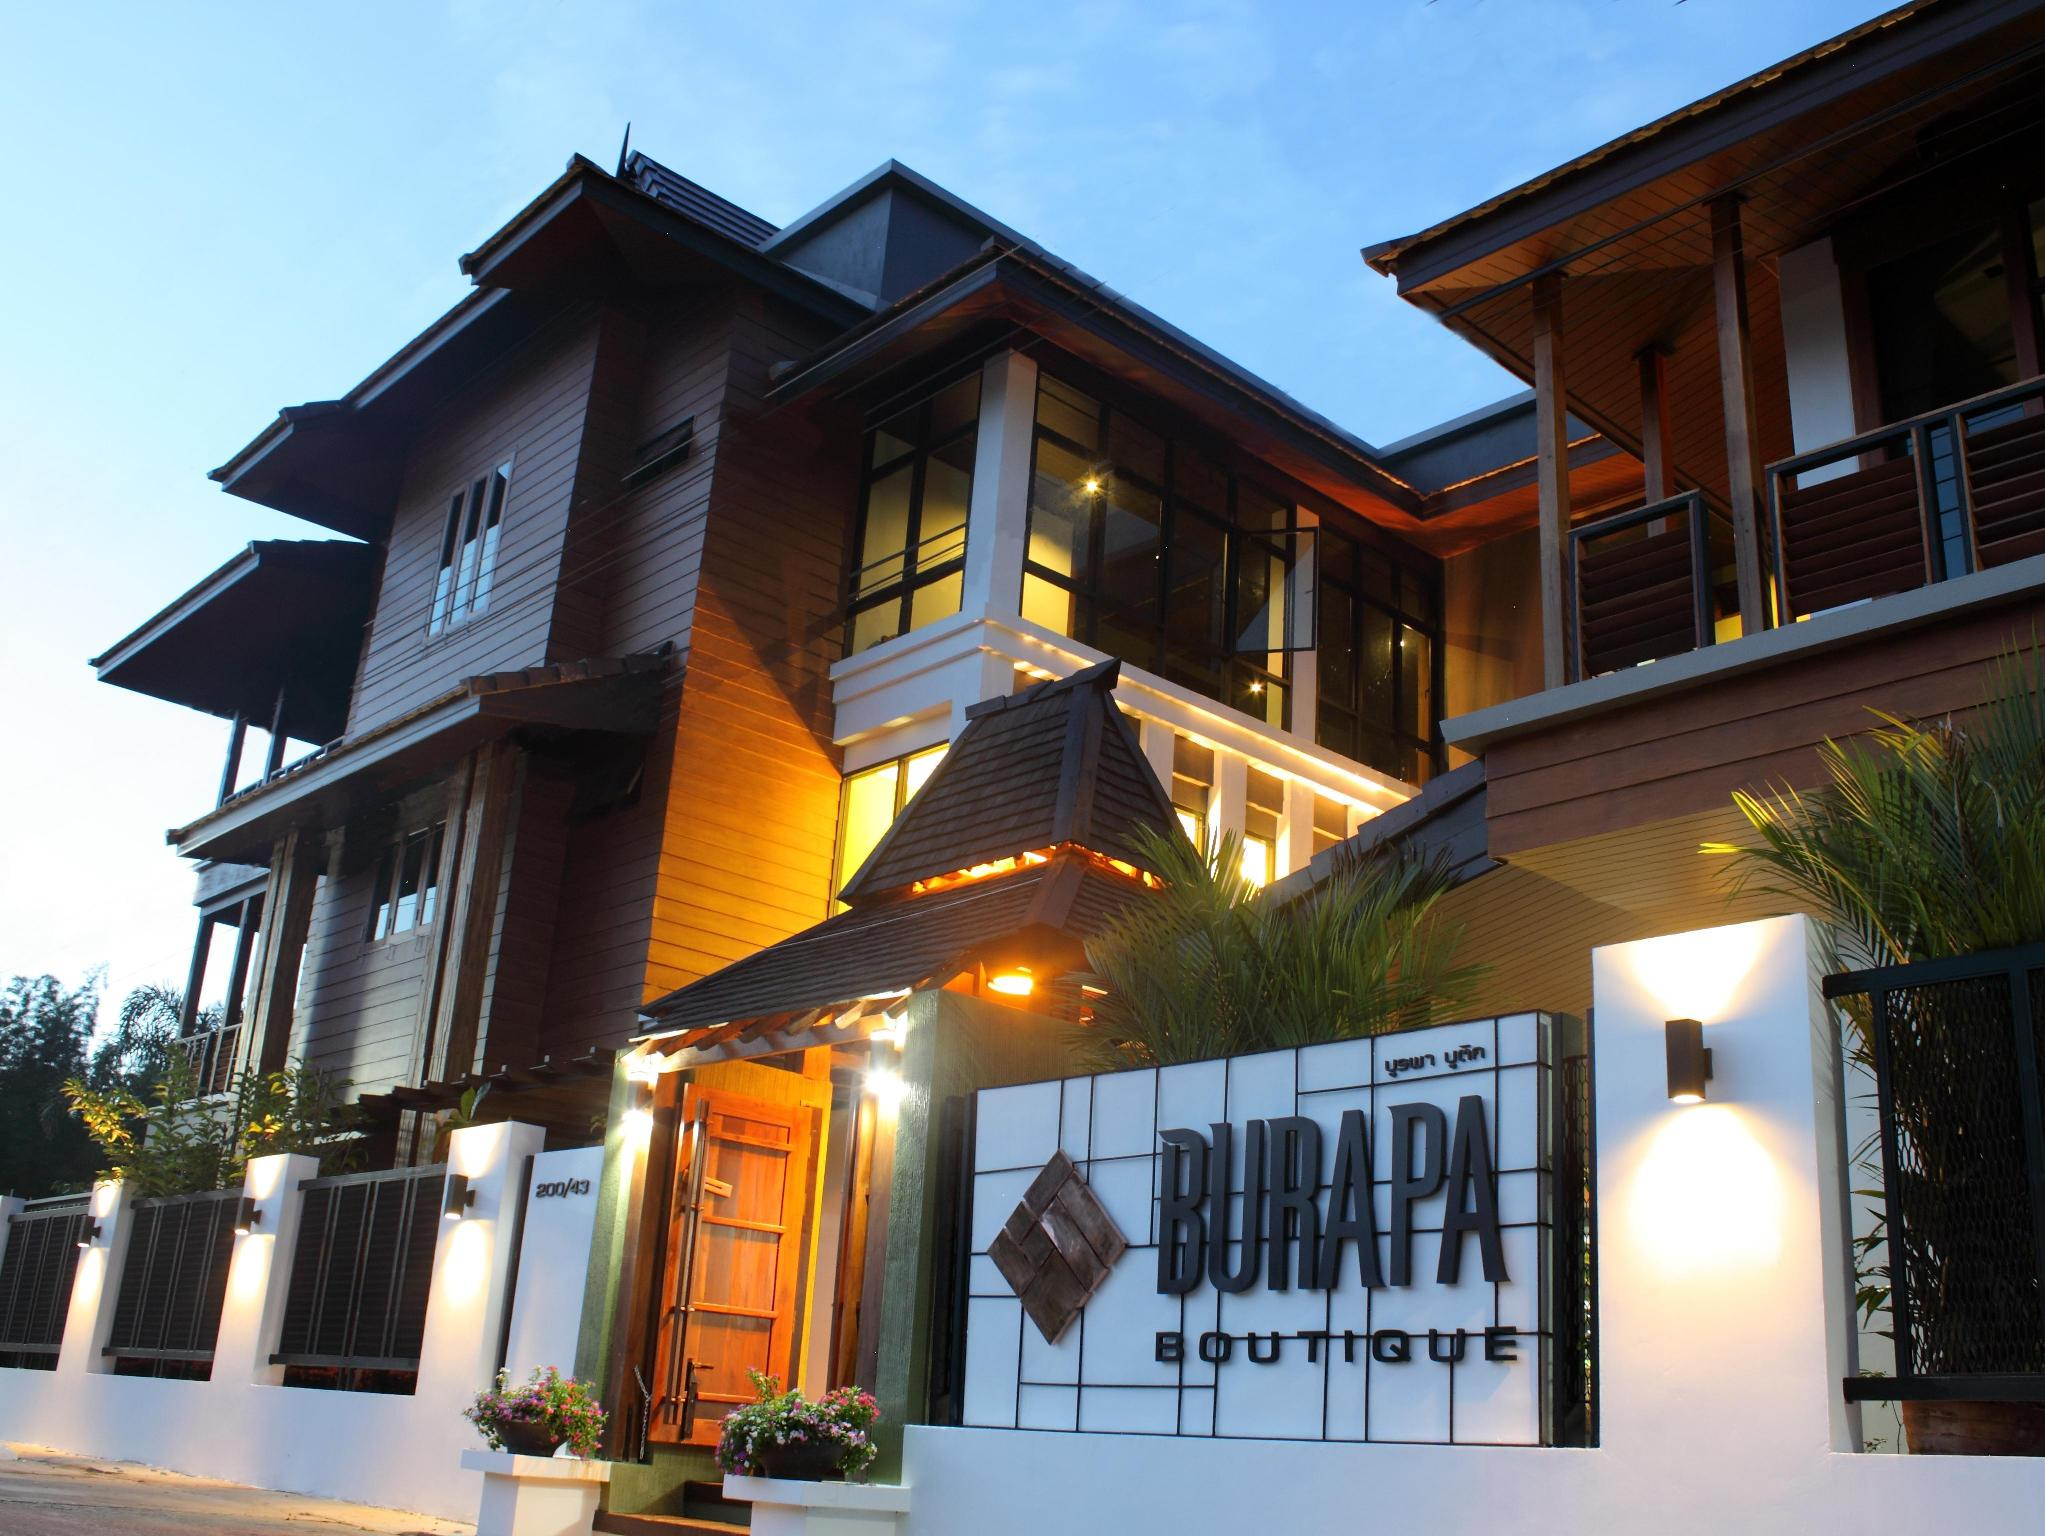 Review บูรพา บูทิก (Burapa Boutique) ราคาประหยัด